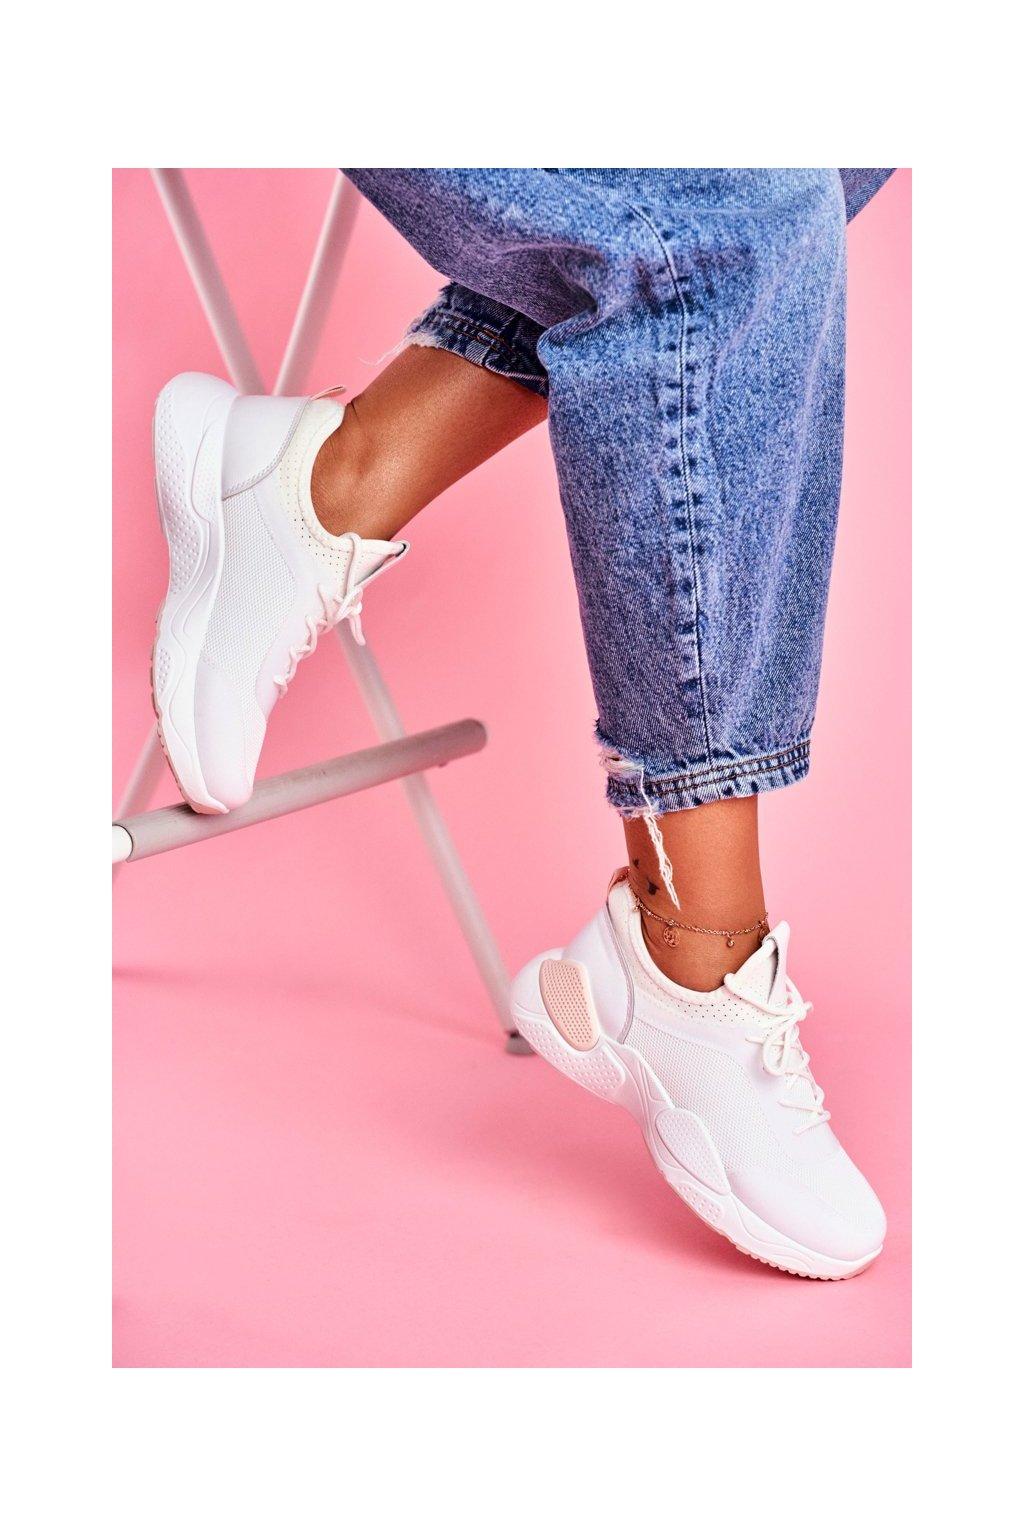 Dámska športová obuv Ružovobiela Fellen kód B0-547